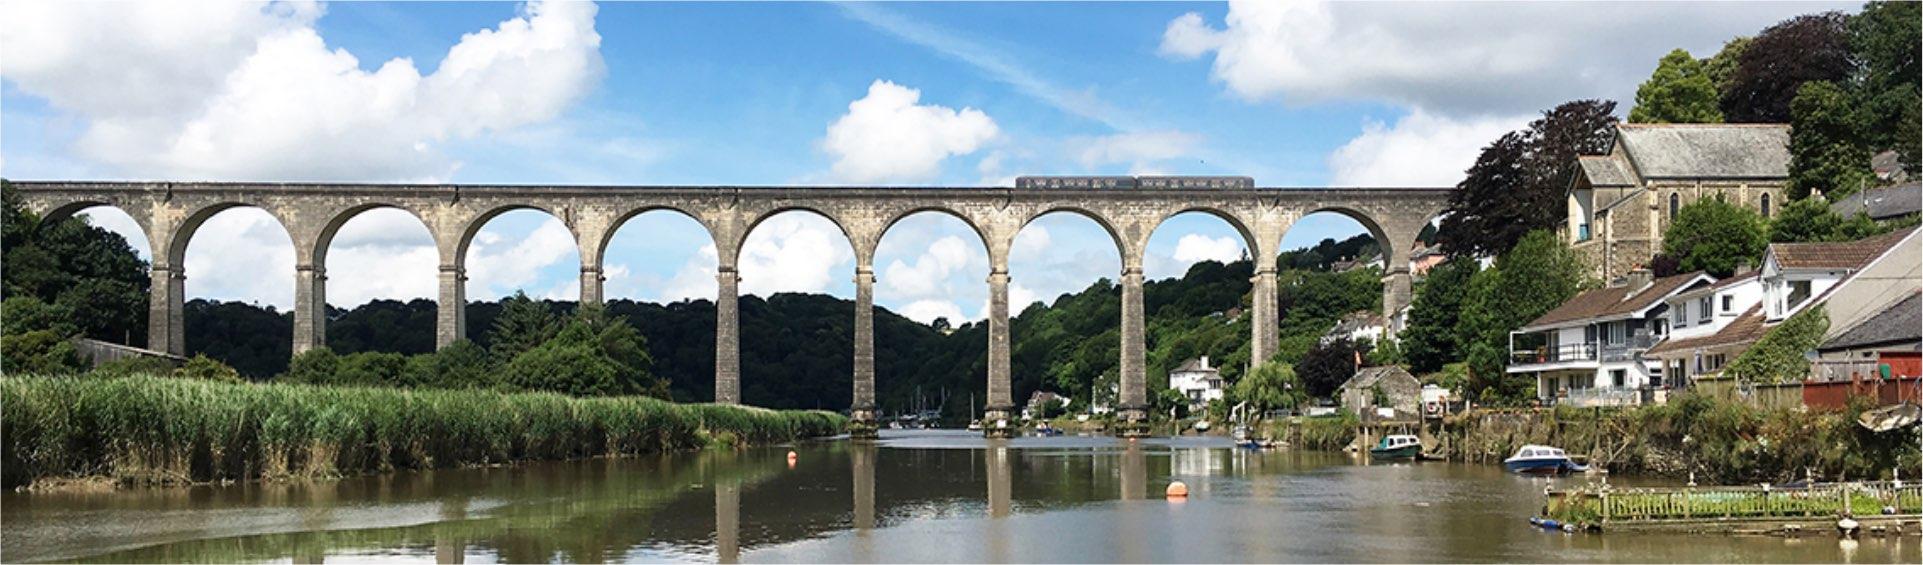 Viaduct bridge with train